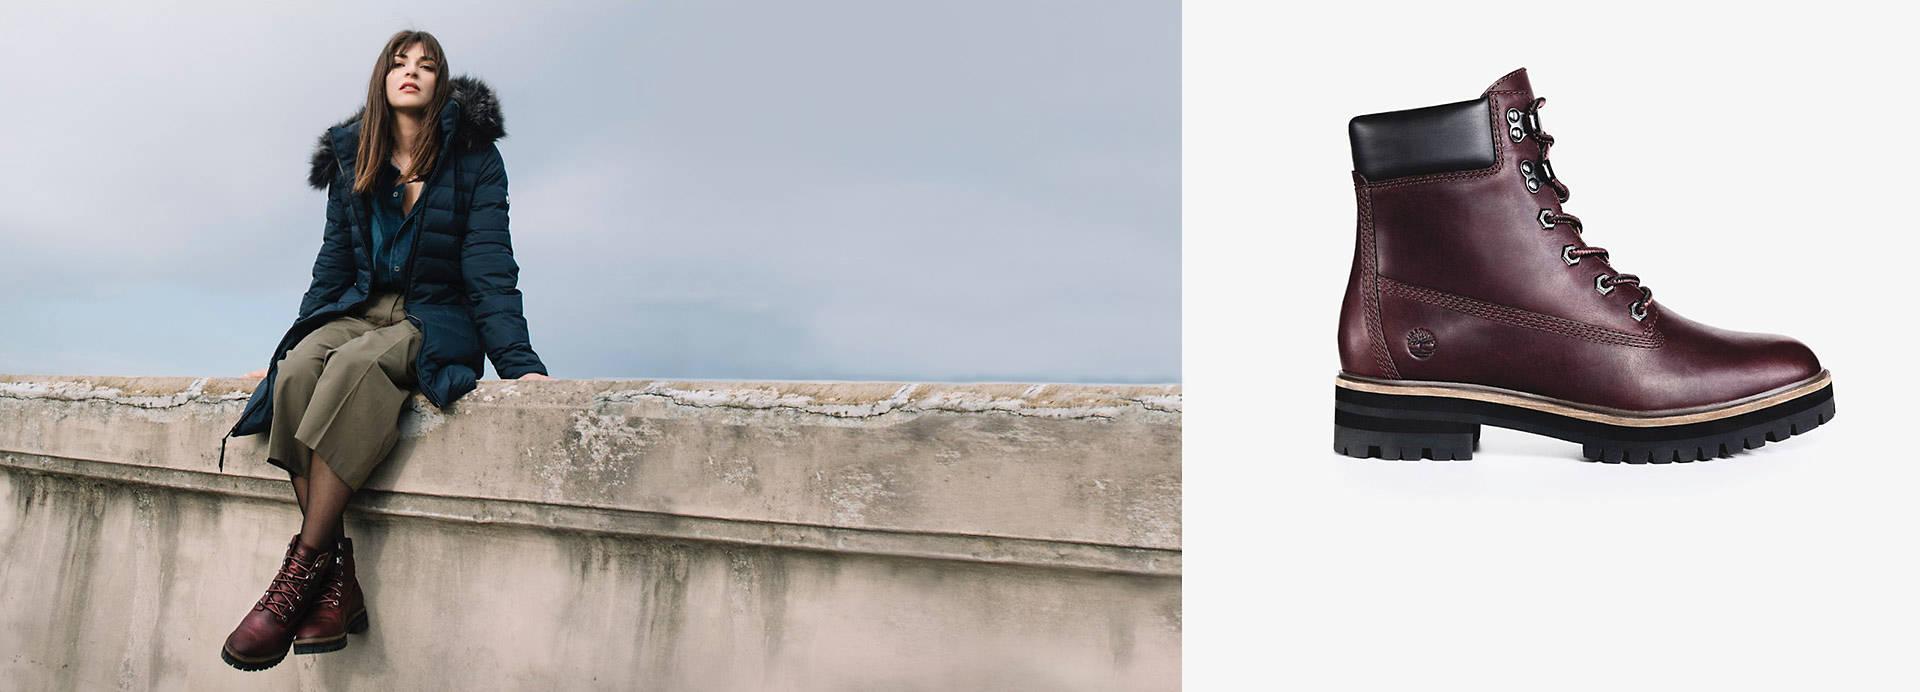 grosse echarpe niagara falls